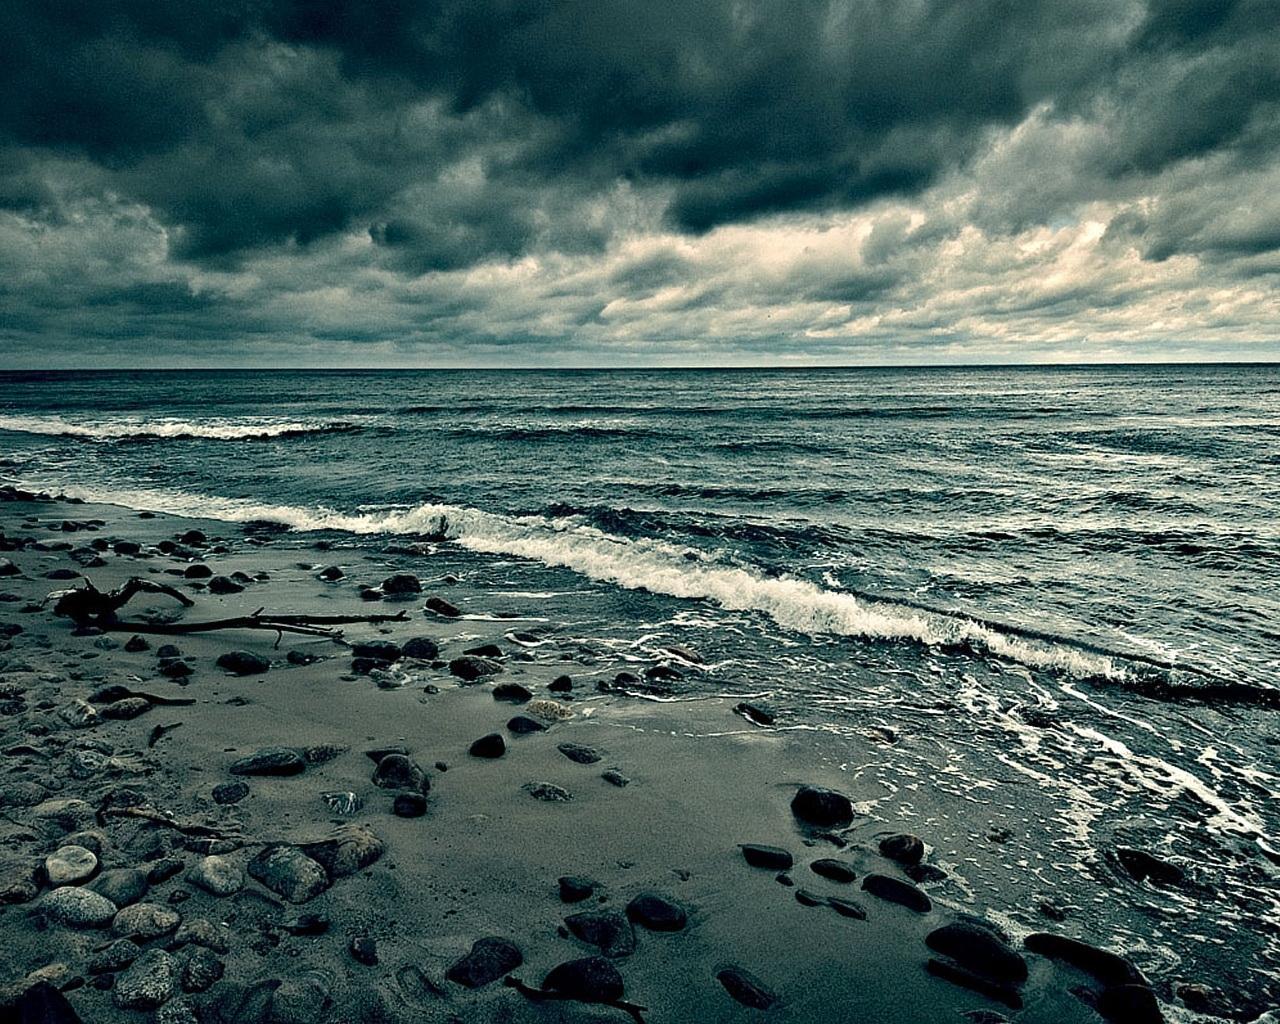 ocean wallpaper evening